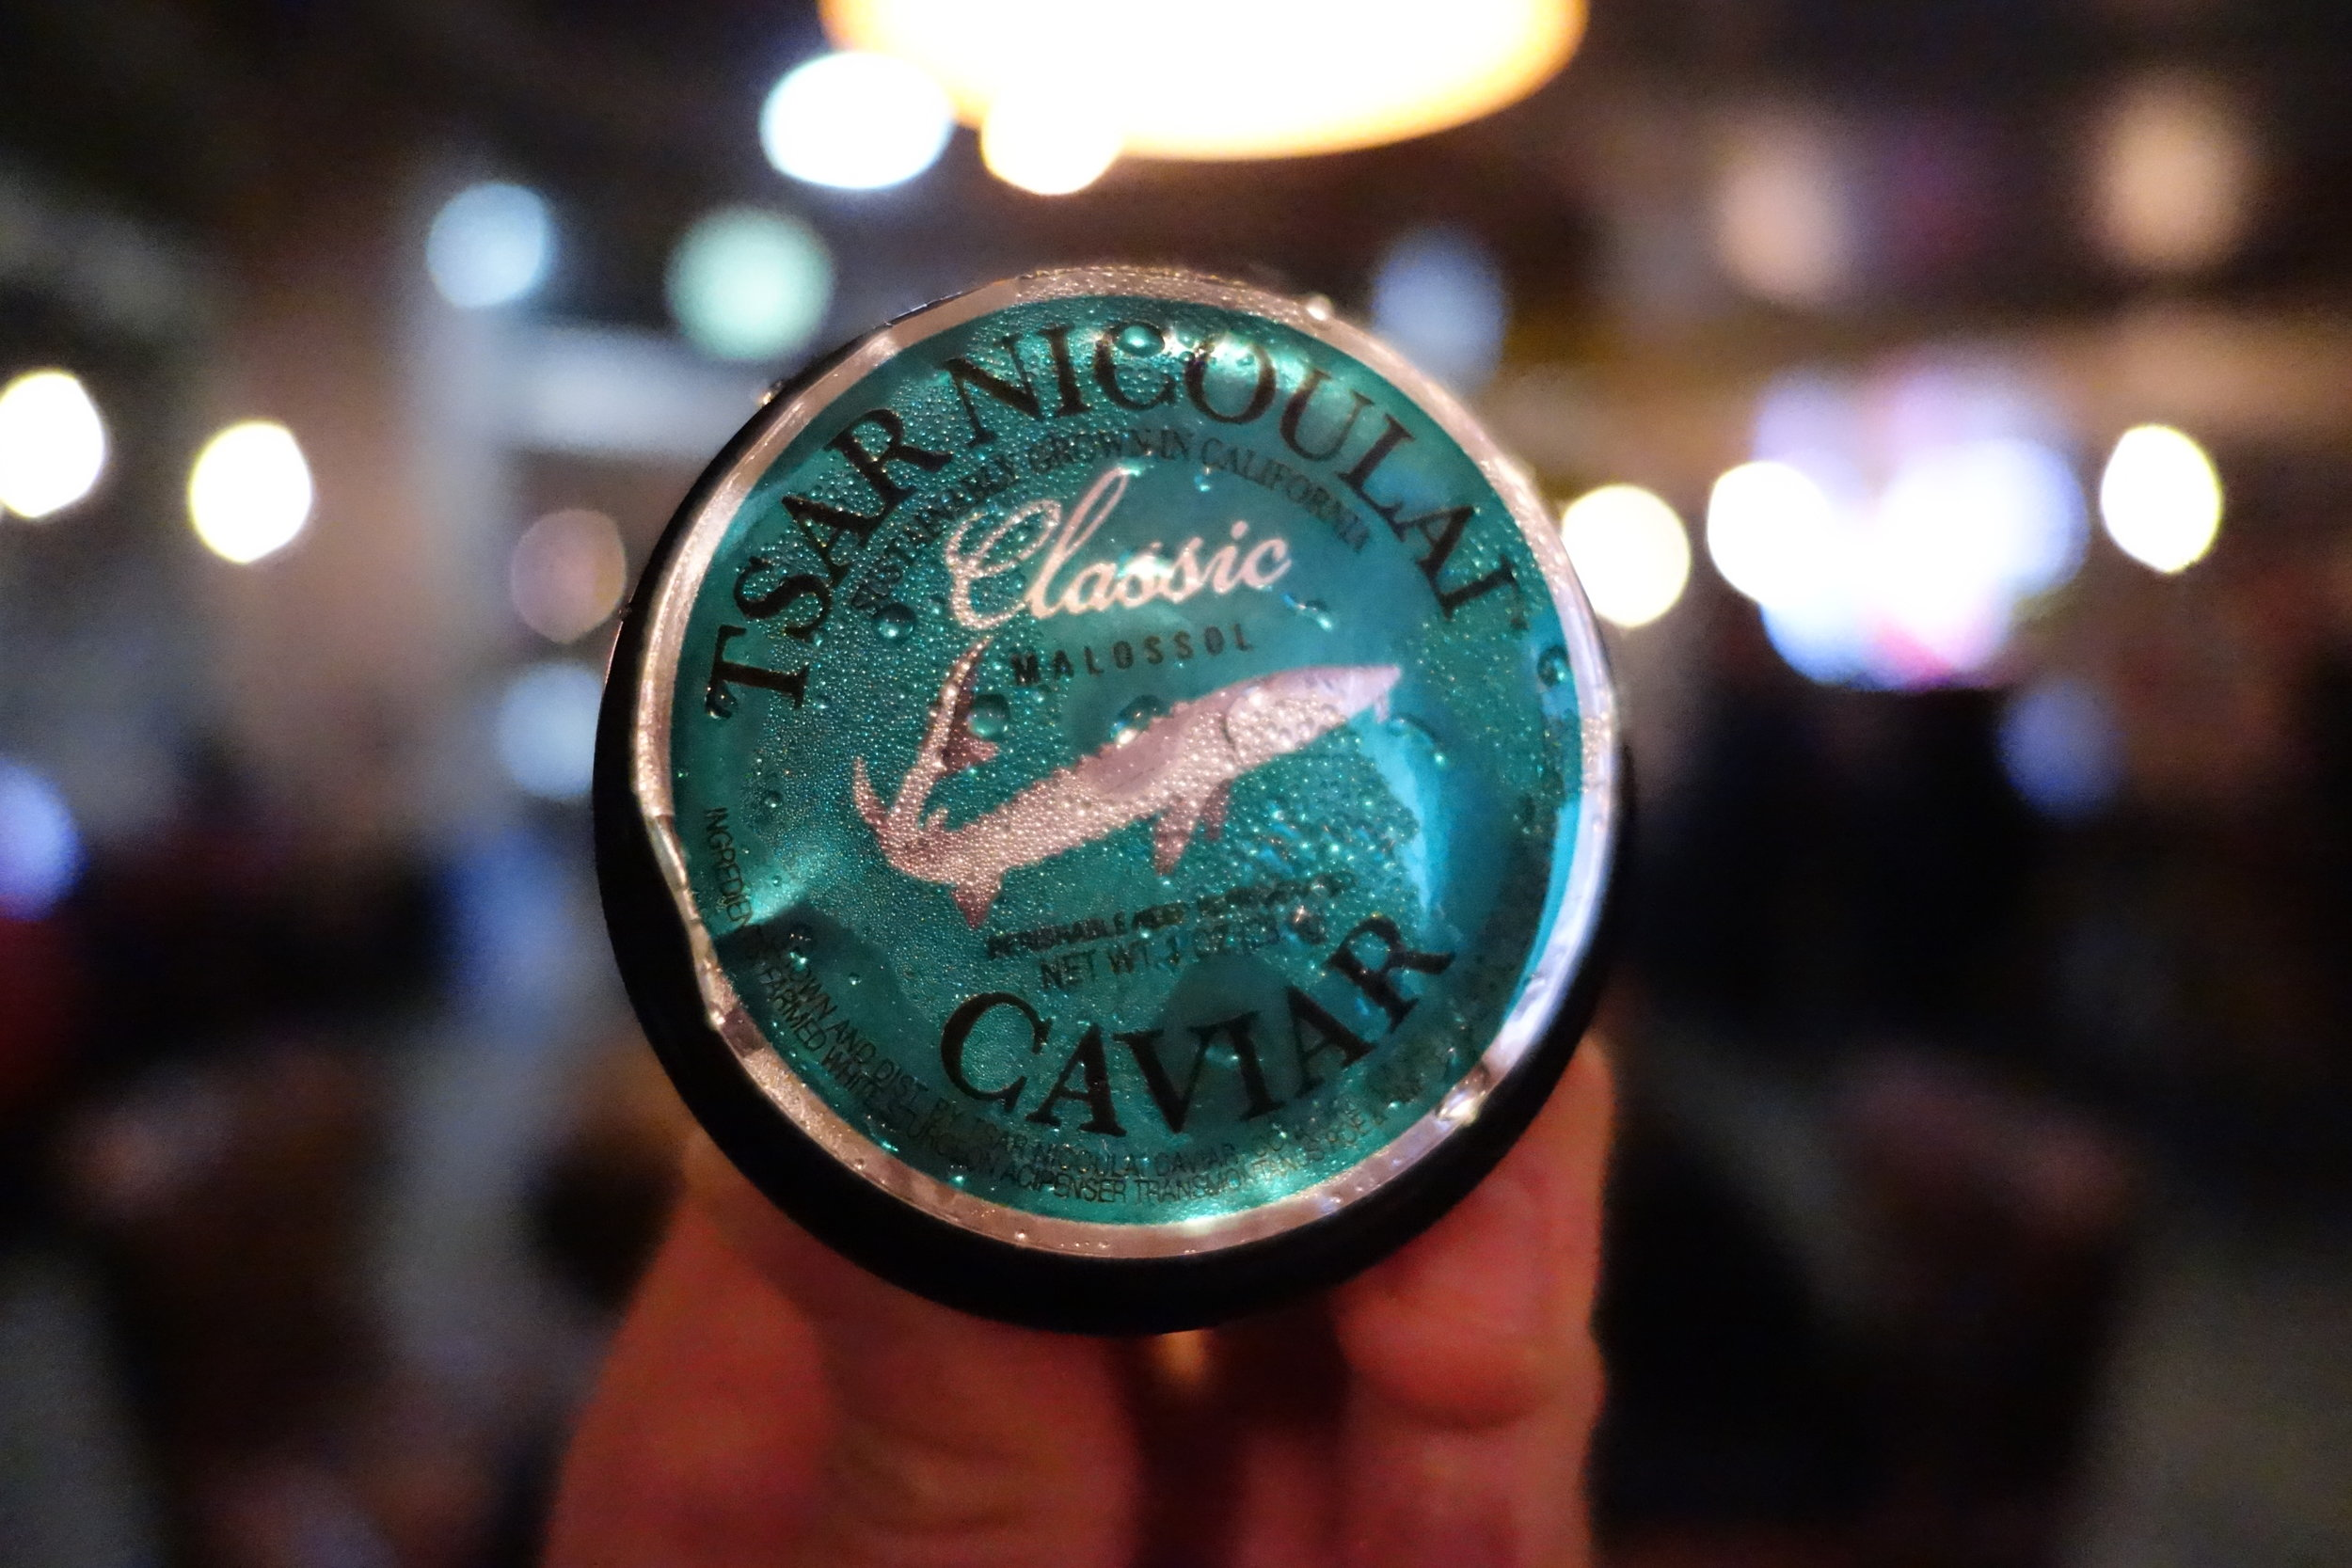 Tsar Nicoulai Classic Sturgeon Caviar